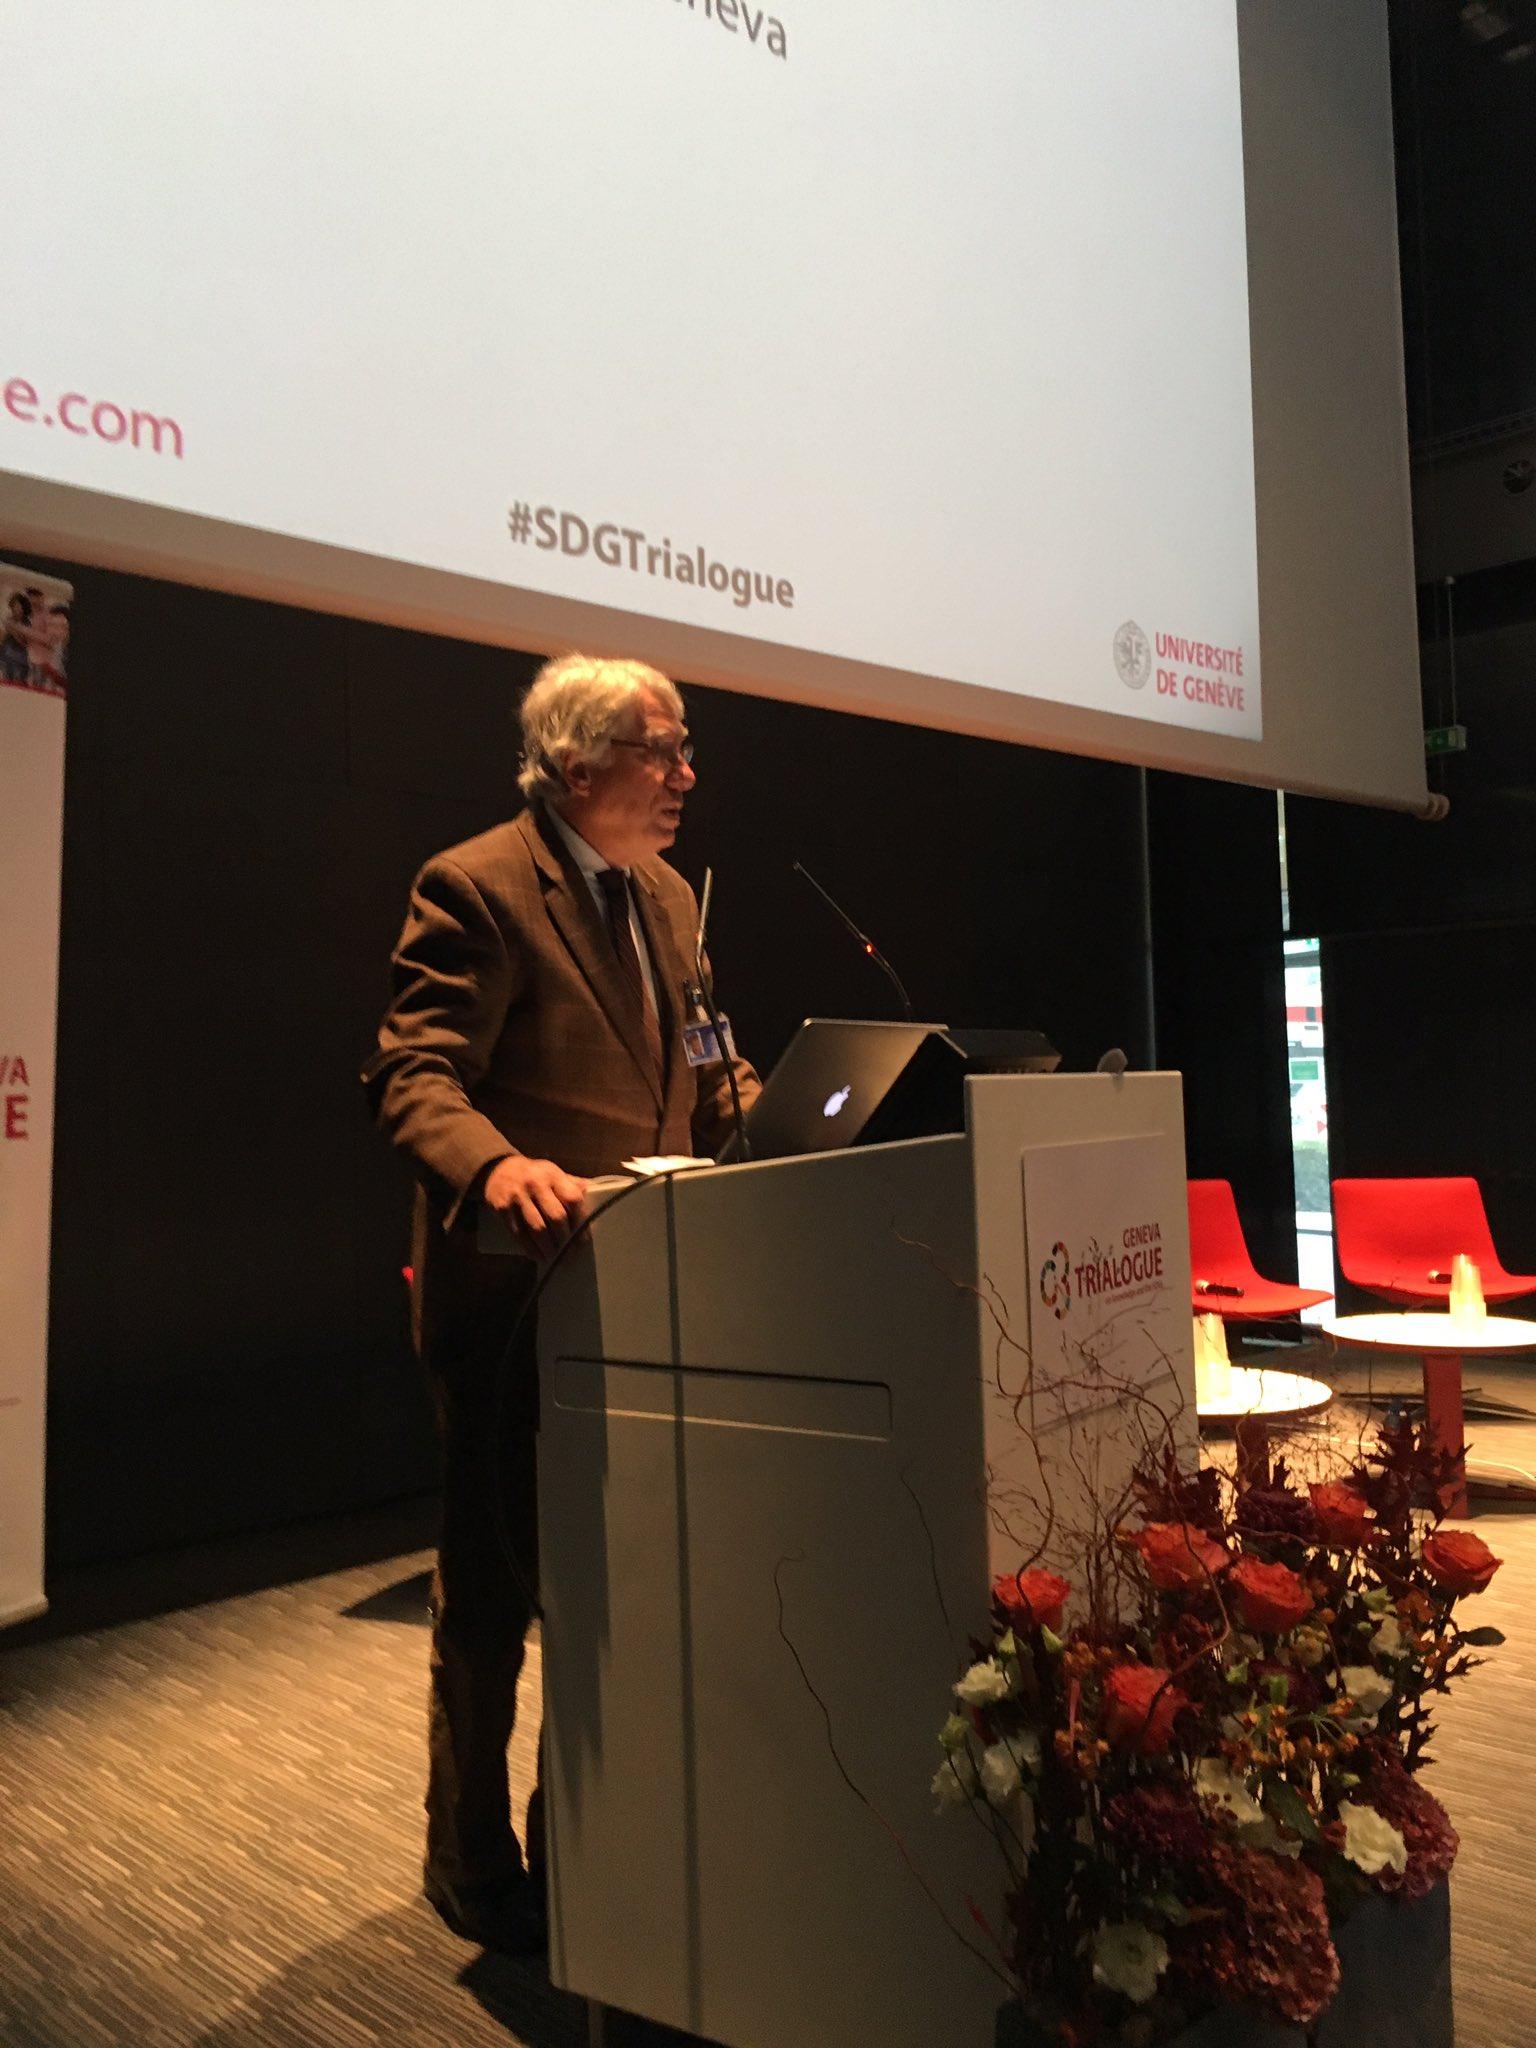 #SDGTrialogue has started - @UNIGEnews Denis Hochstrasser opens the floor! https://t.co/QlR2pLn3Pl